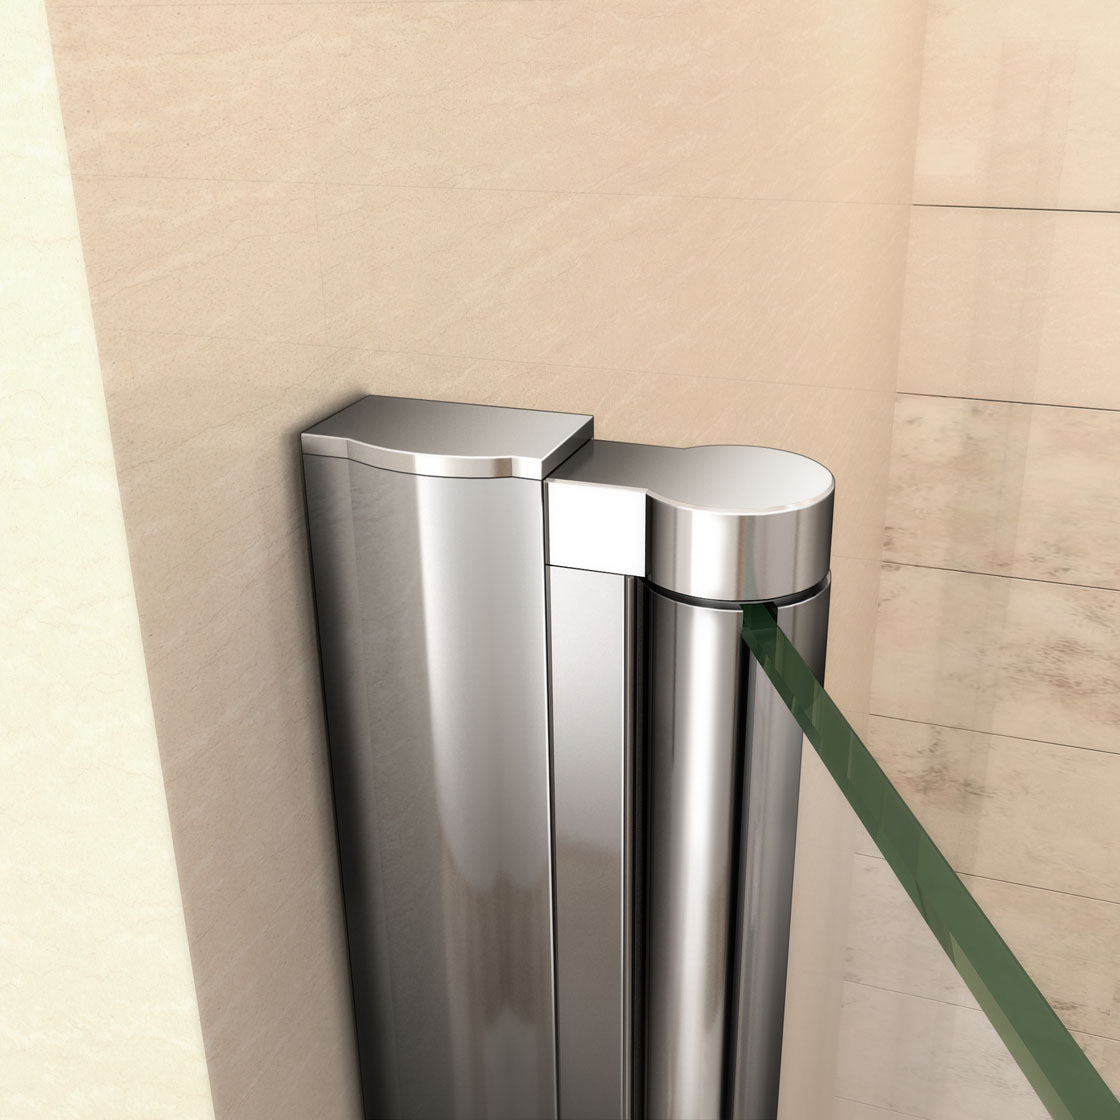 aica pivot hinge quadrant corner entry shower enclosure. Black Bedroom Furniture Sets. Home Design Ideas